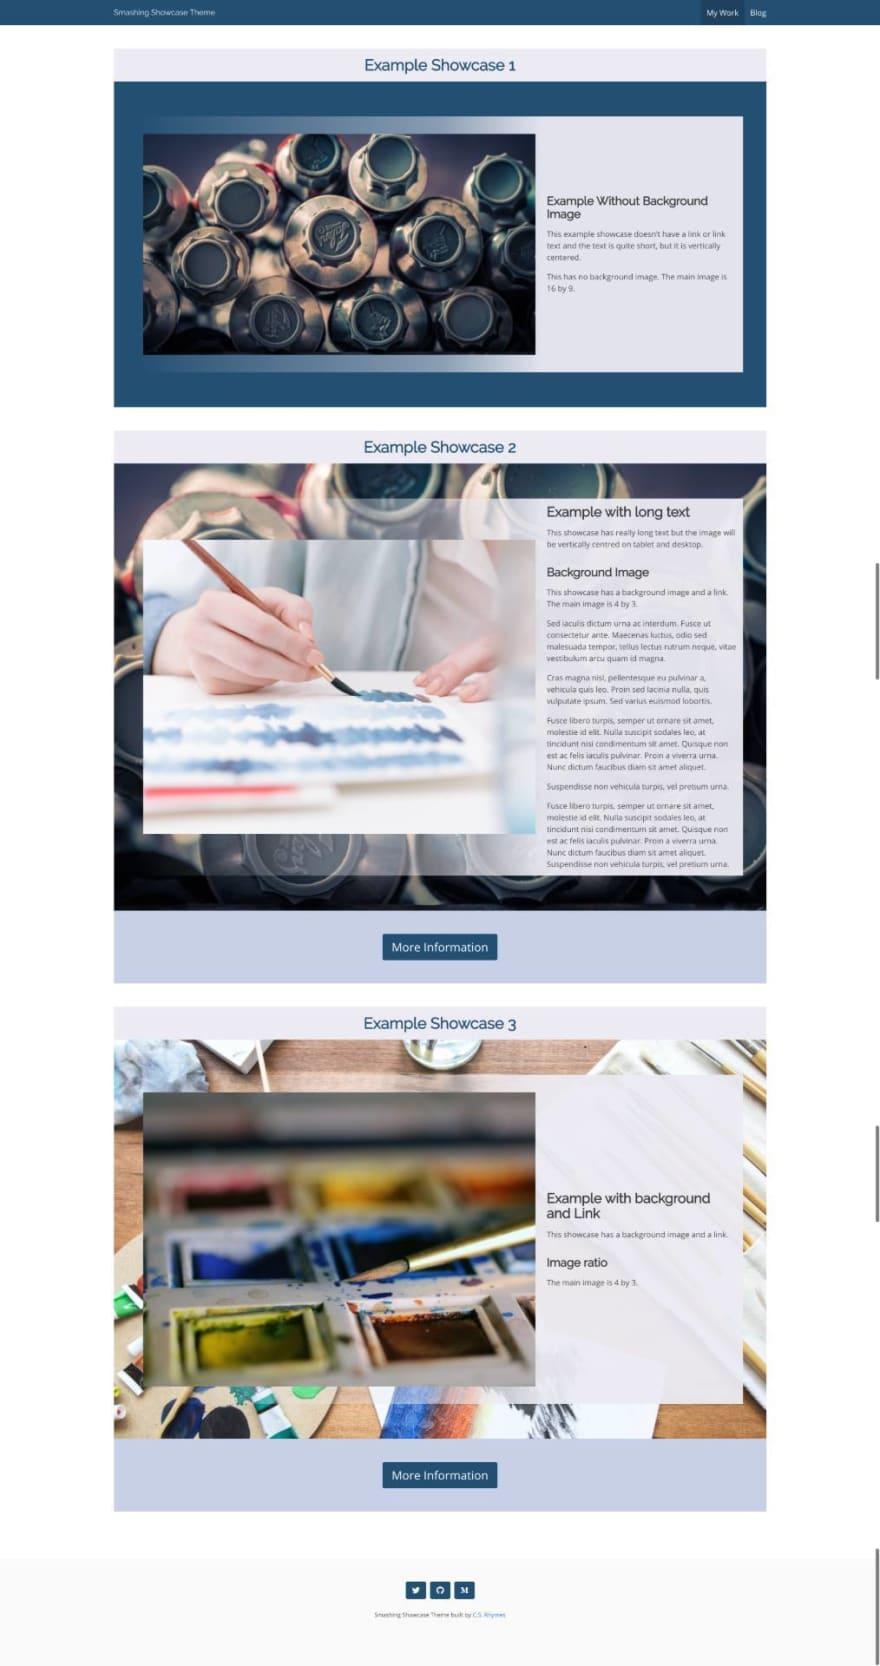 Showcase page layout